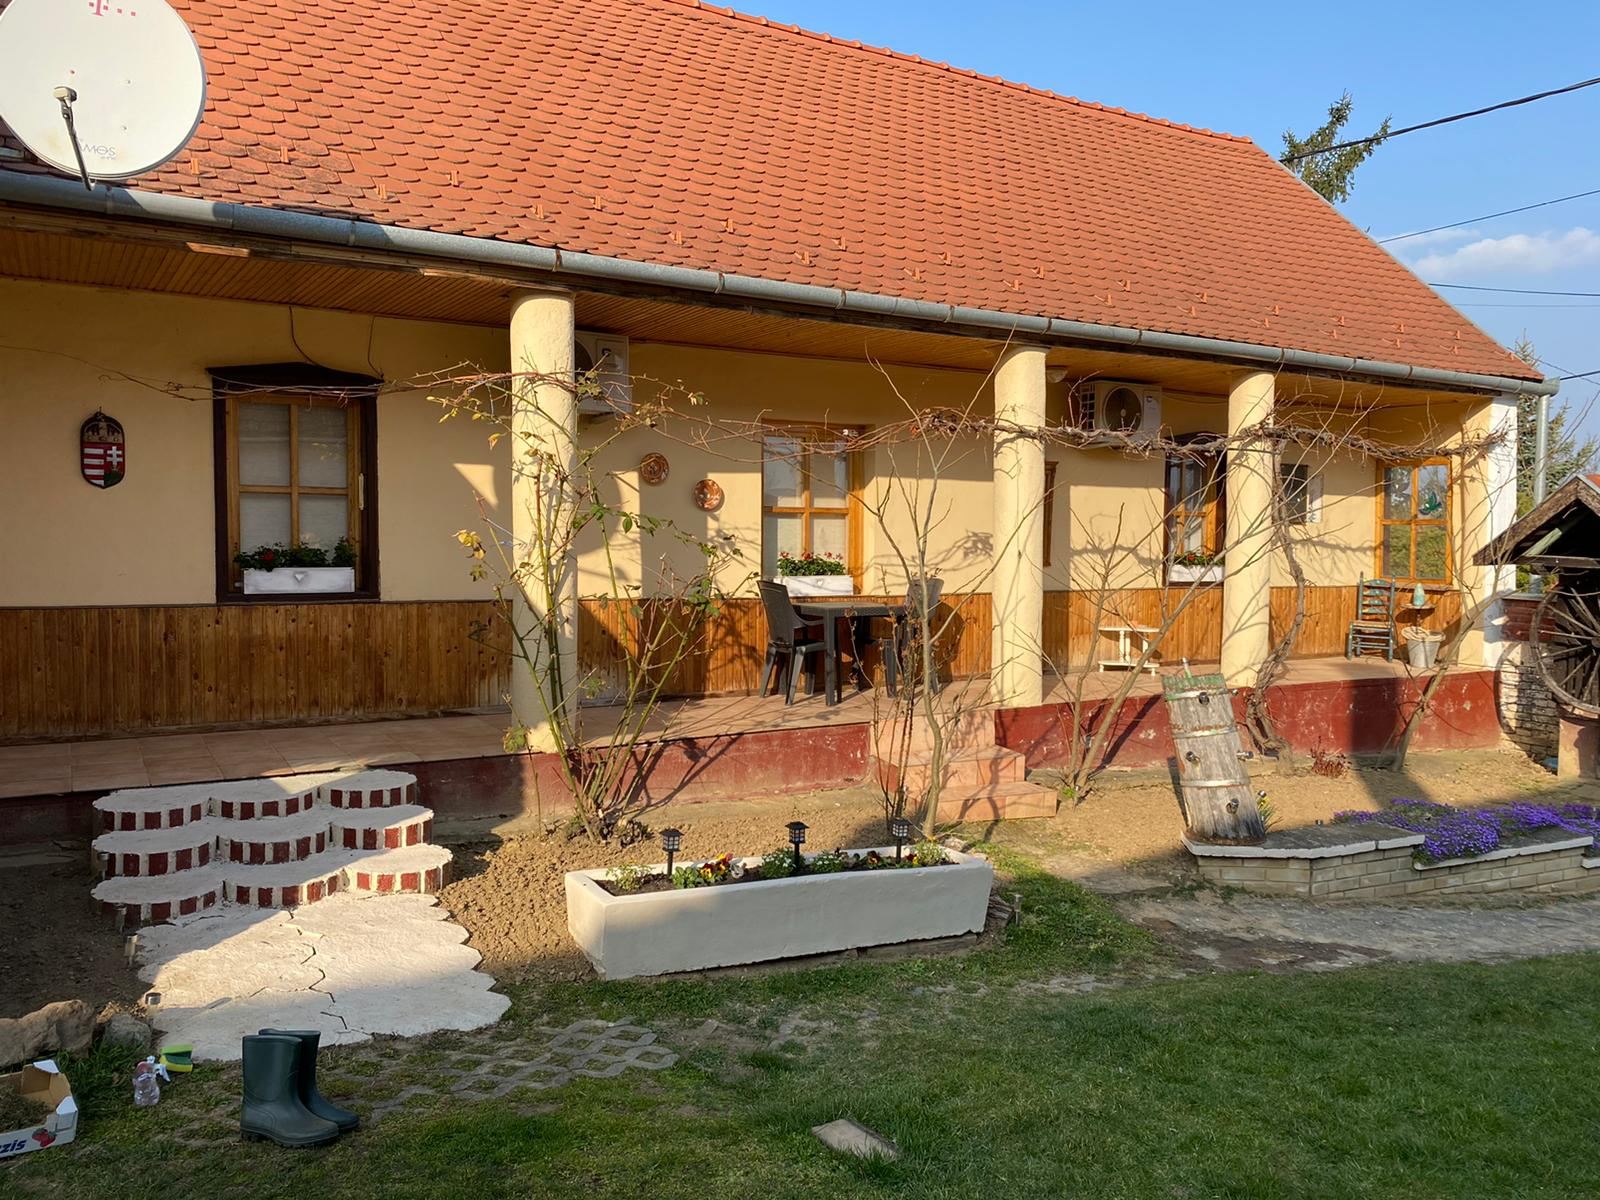 Zomer Het Hongaarse Huisje 4 Vakantie Woning Hongarije